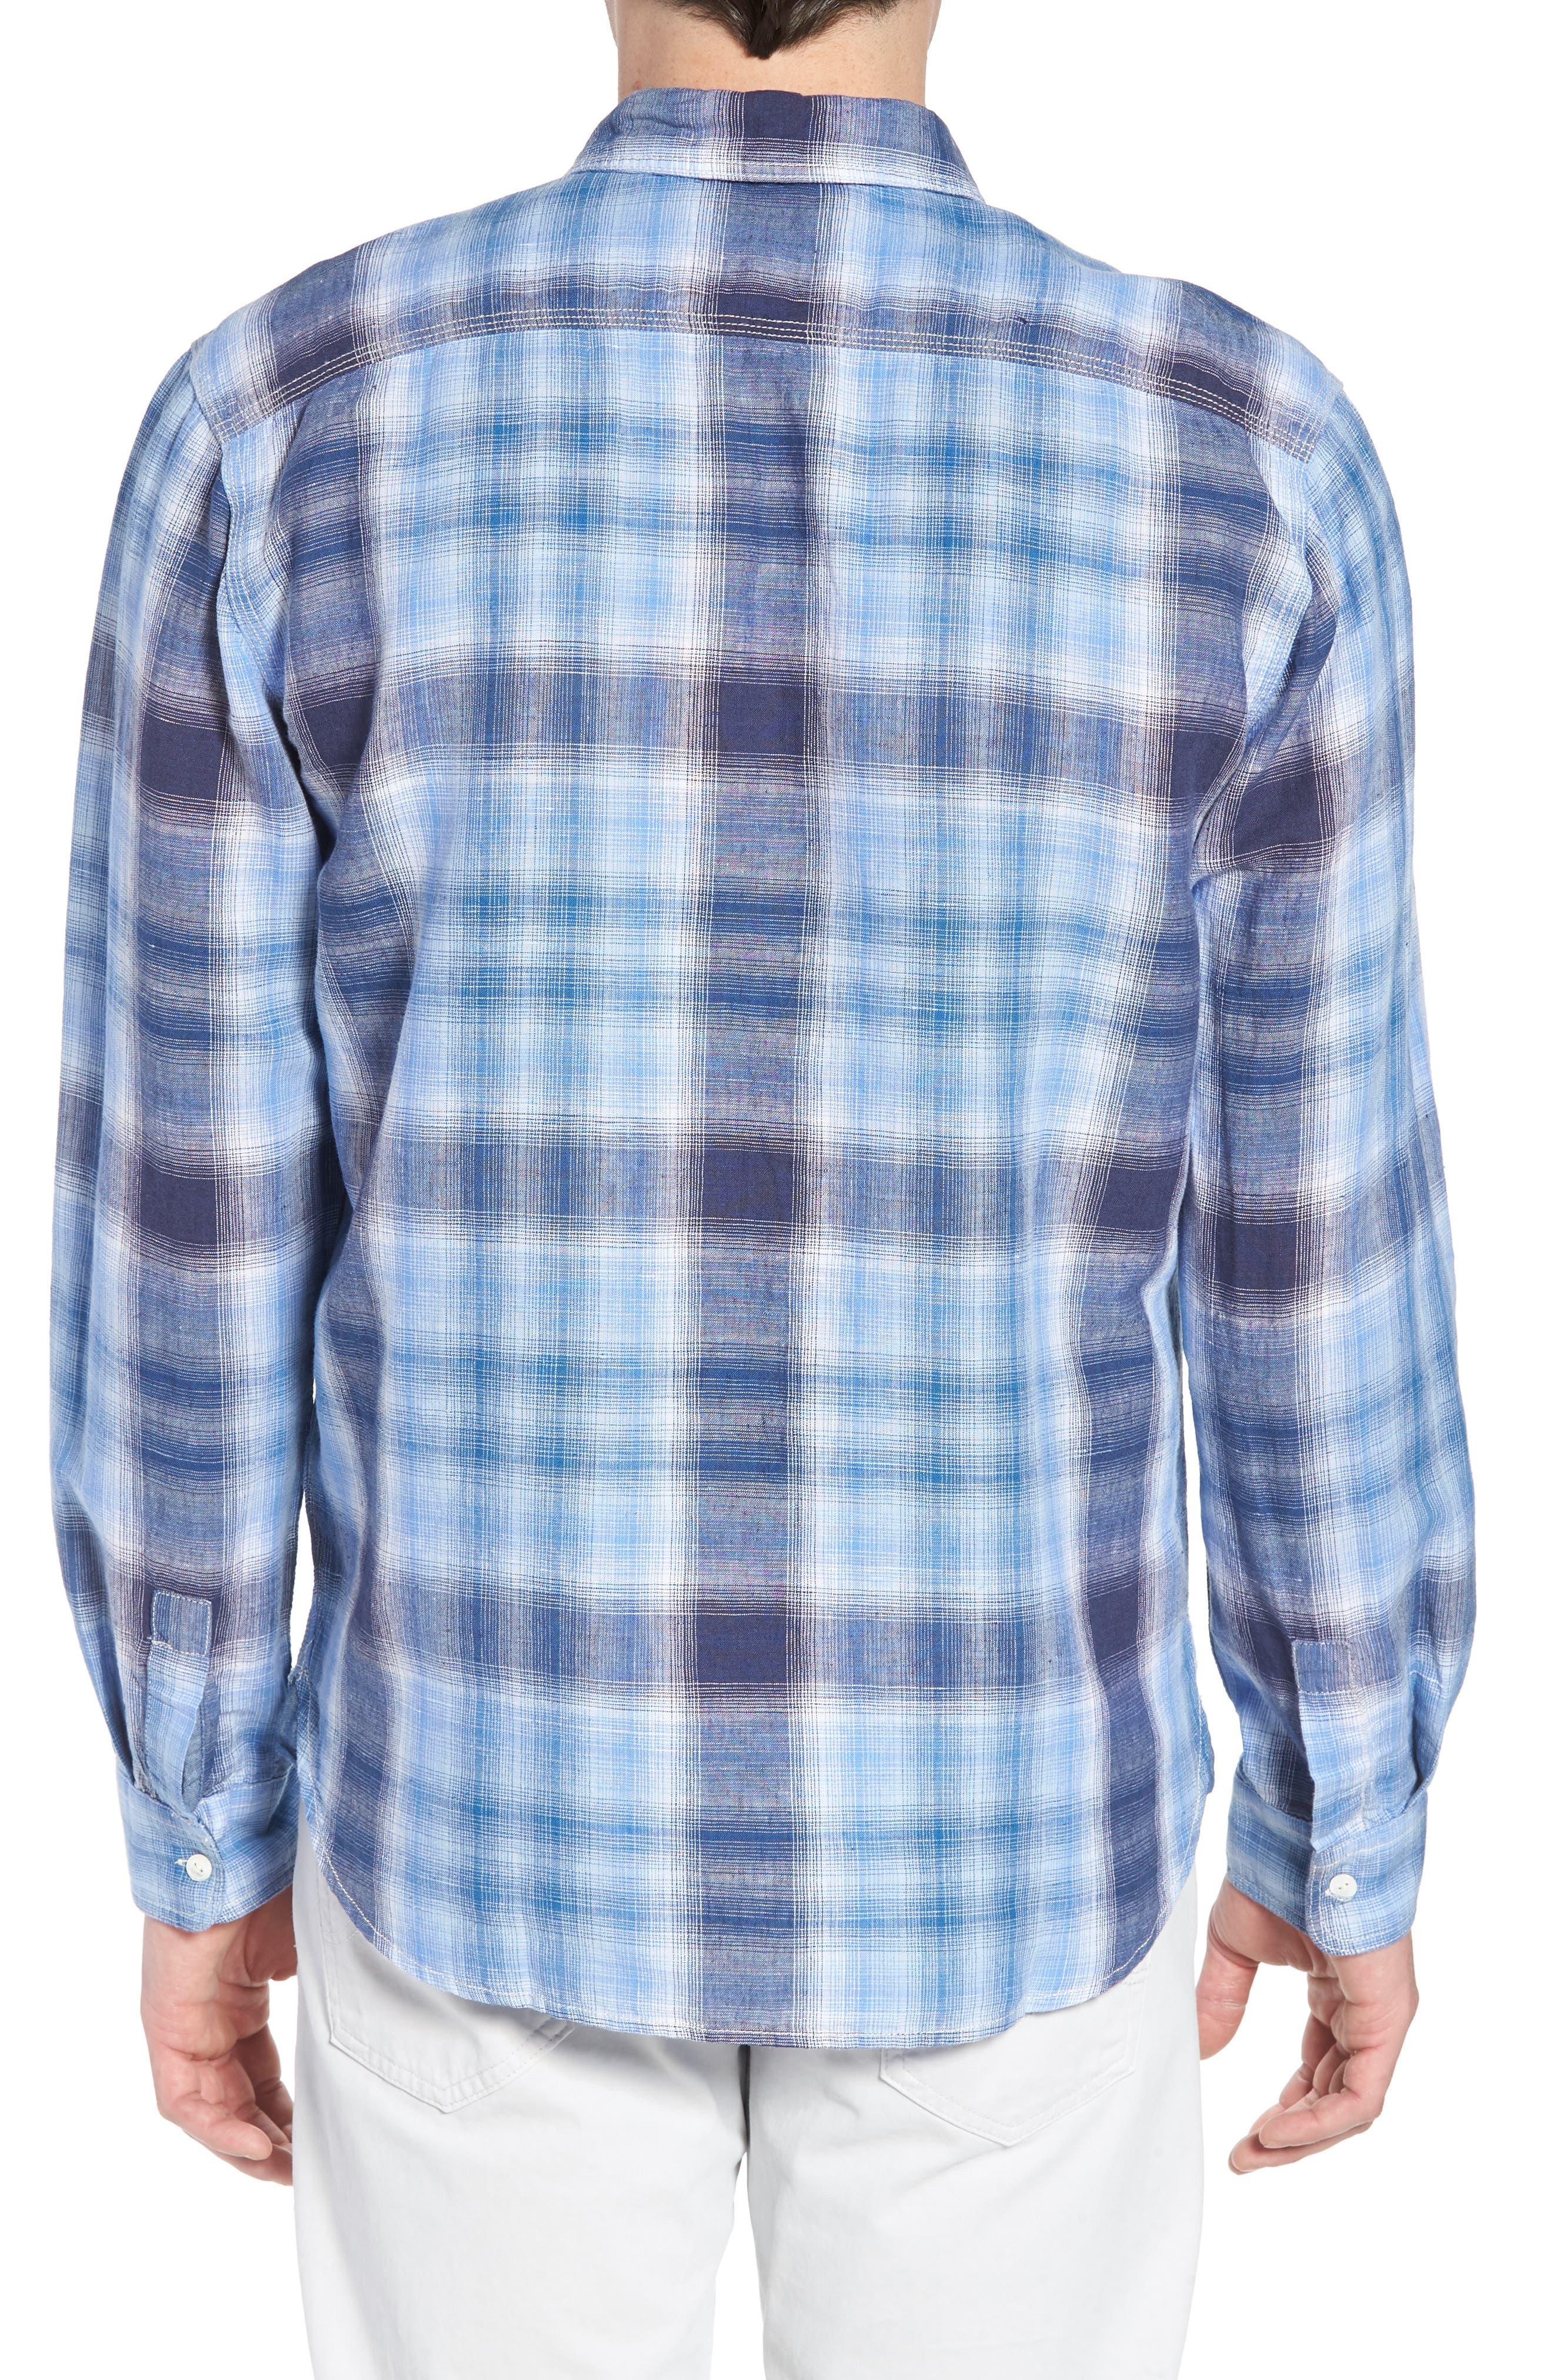 Trestles Linen & Cotton Sport Shirt,                             Alternate thumbnail 2, color,                             400